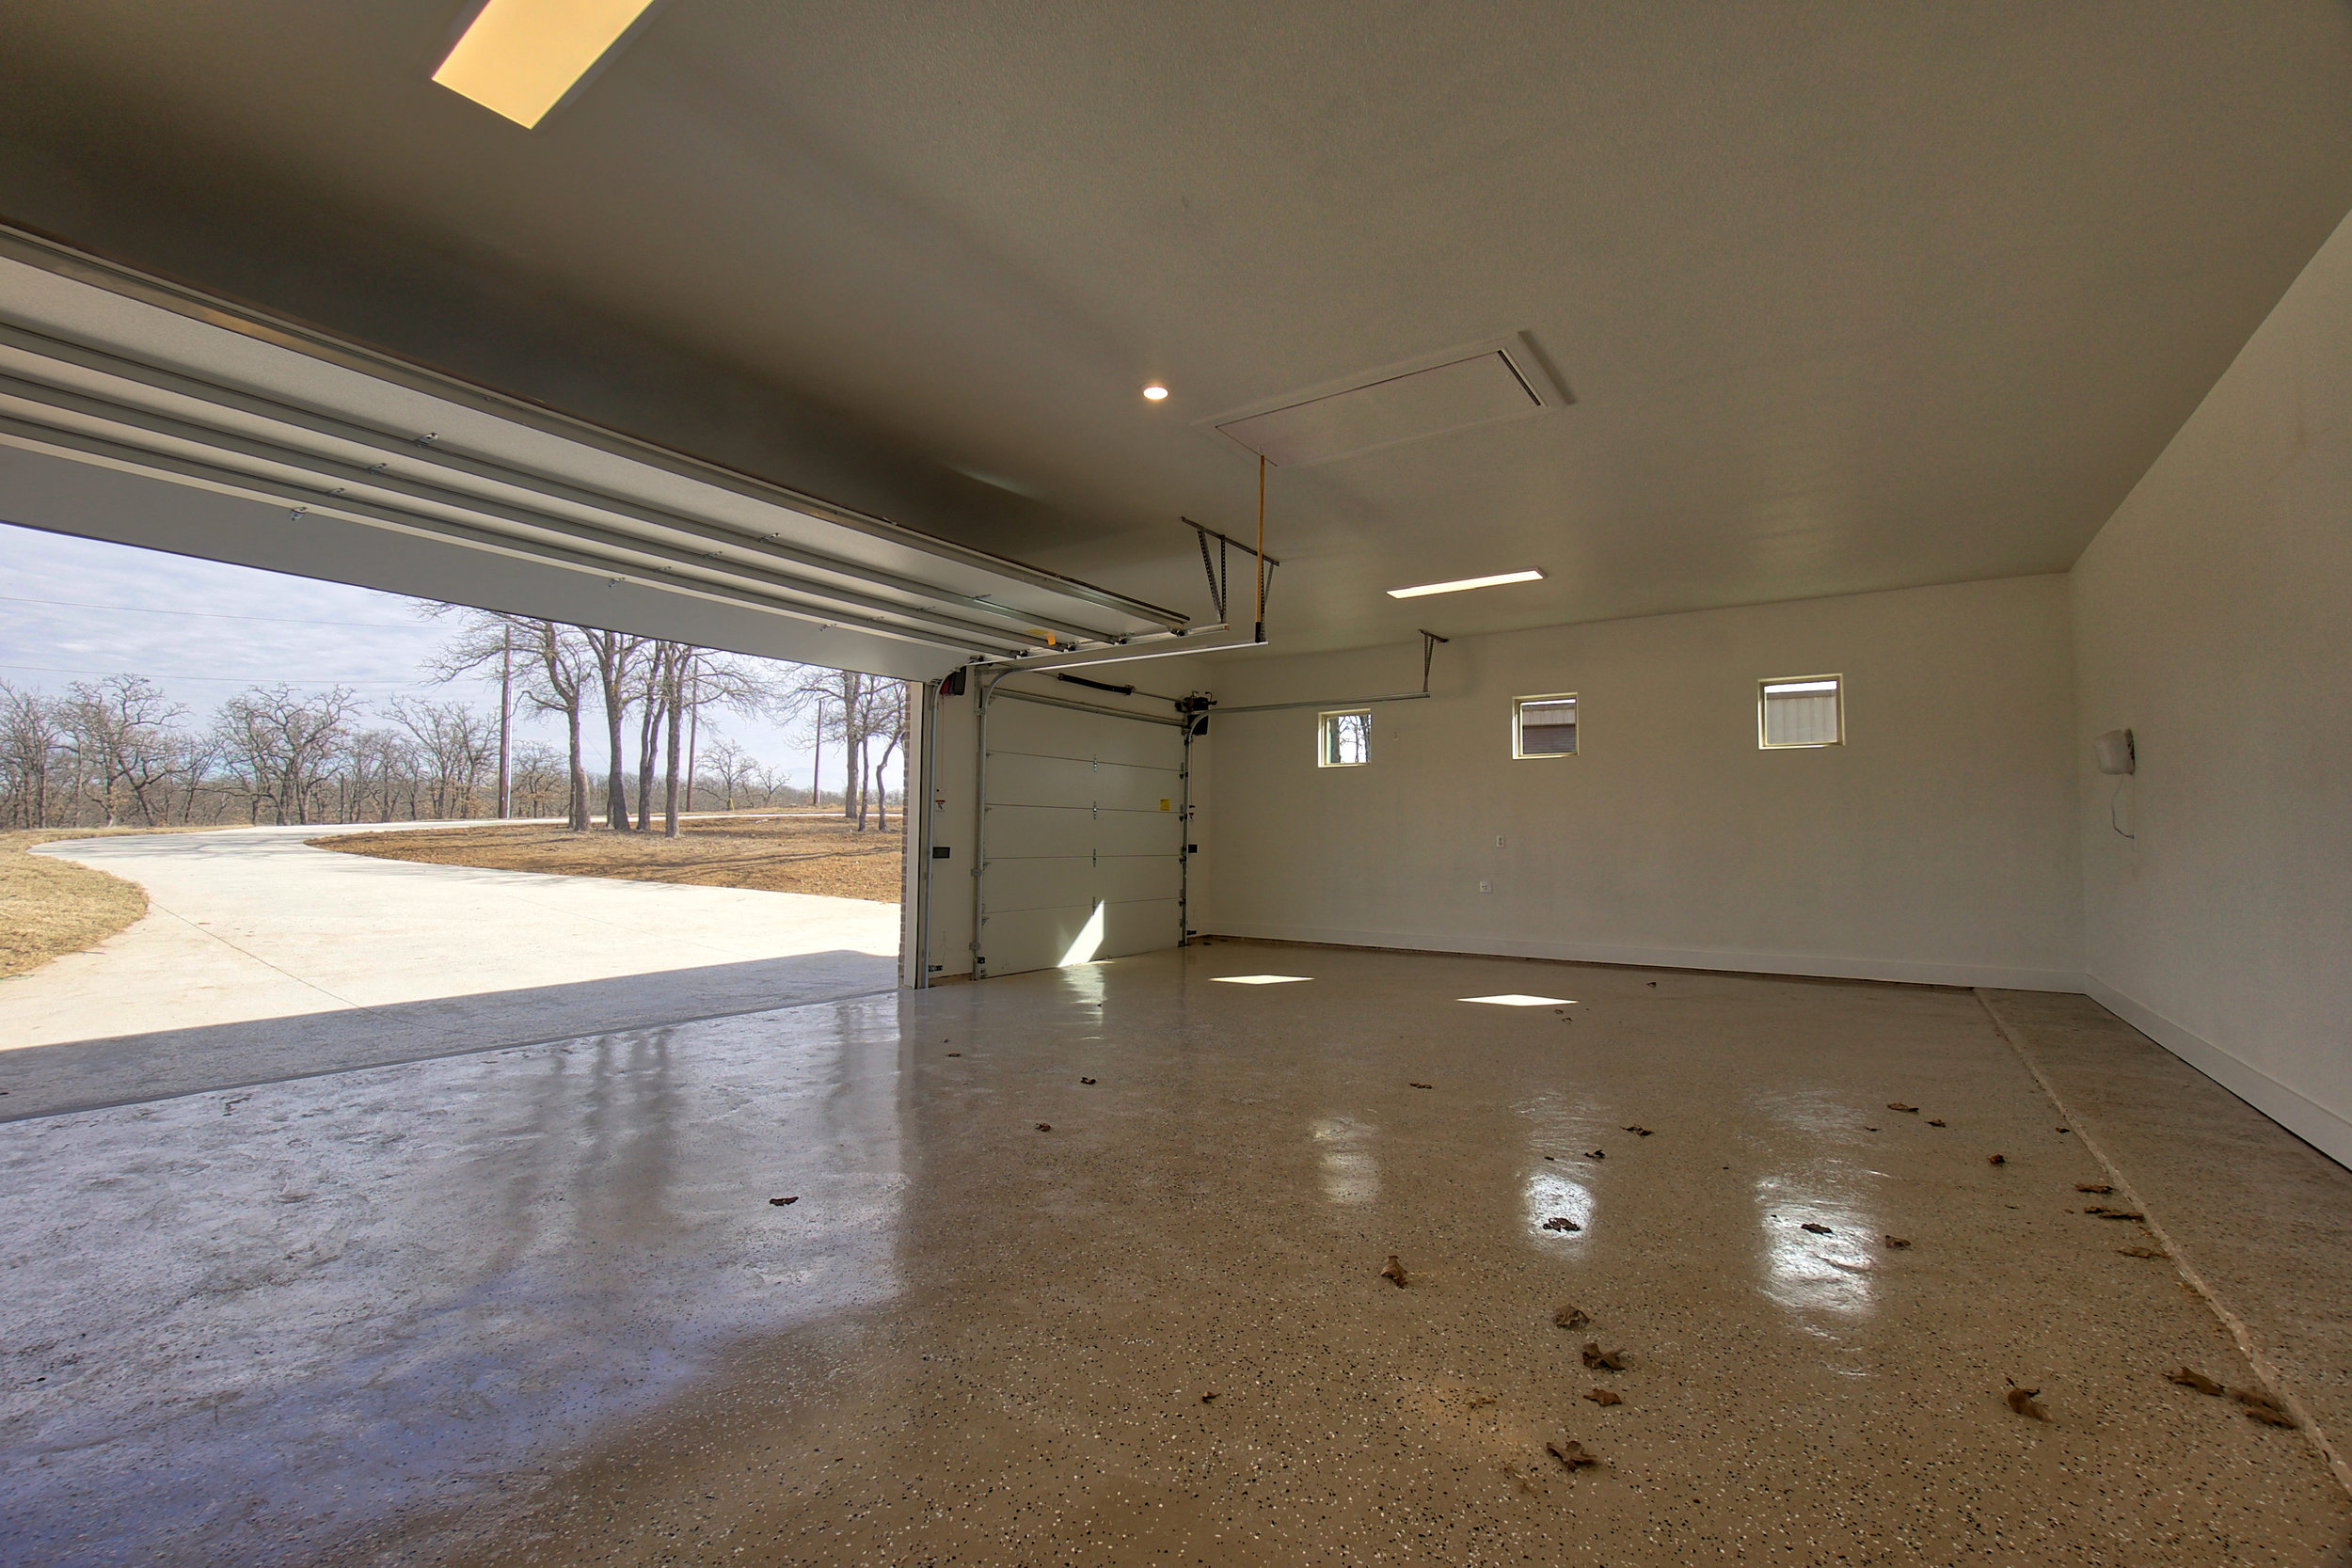 41 garage.jpeg